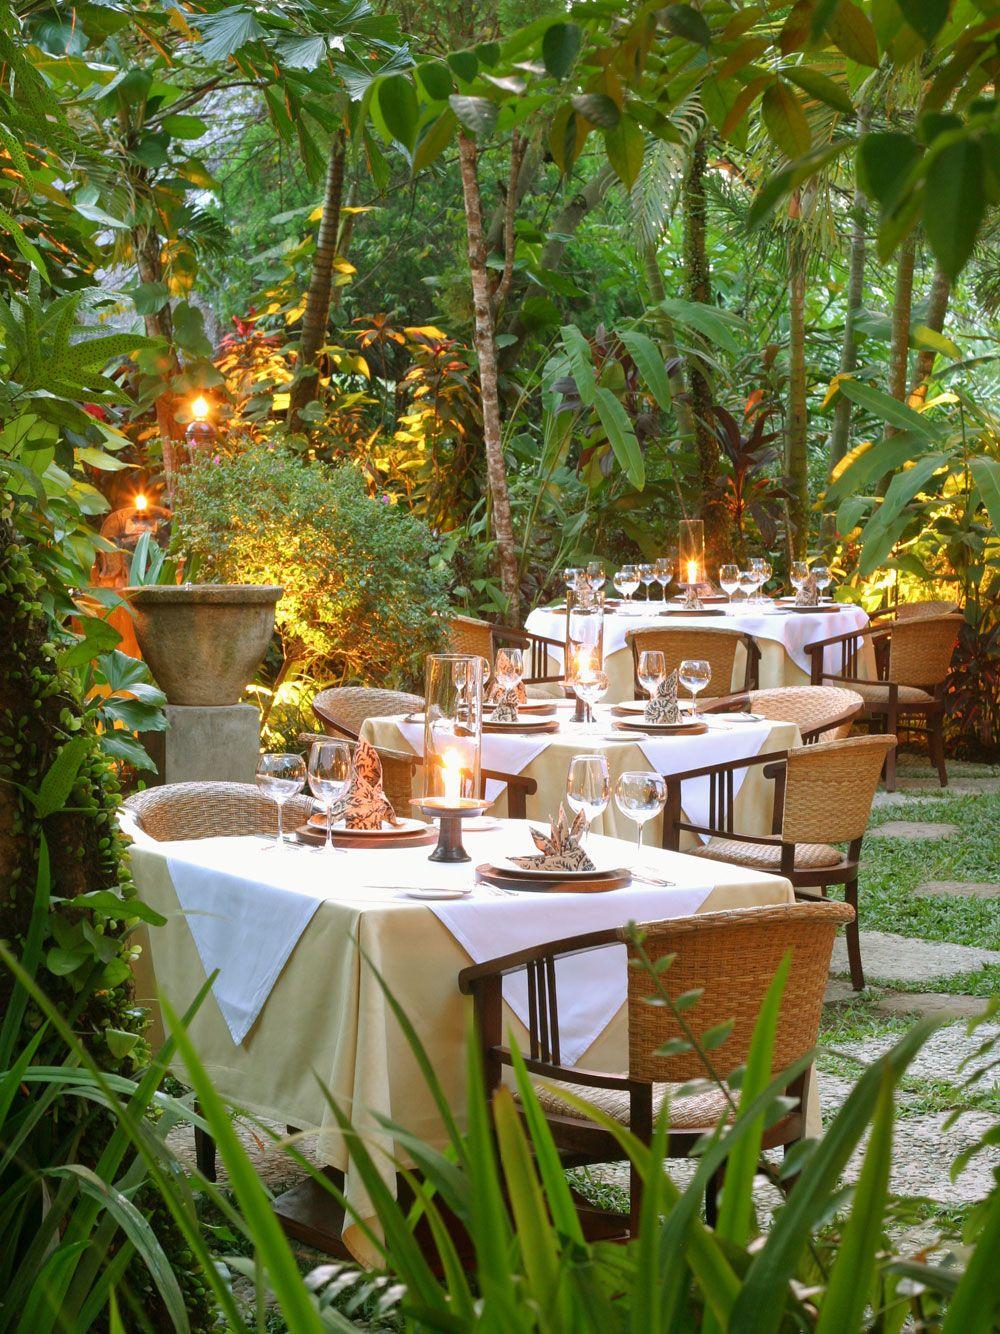 Indonesian Table Setting Mozaic Restaurant Ubud Bali Bali Pinterest Restaurant